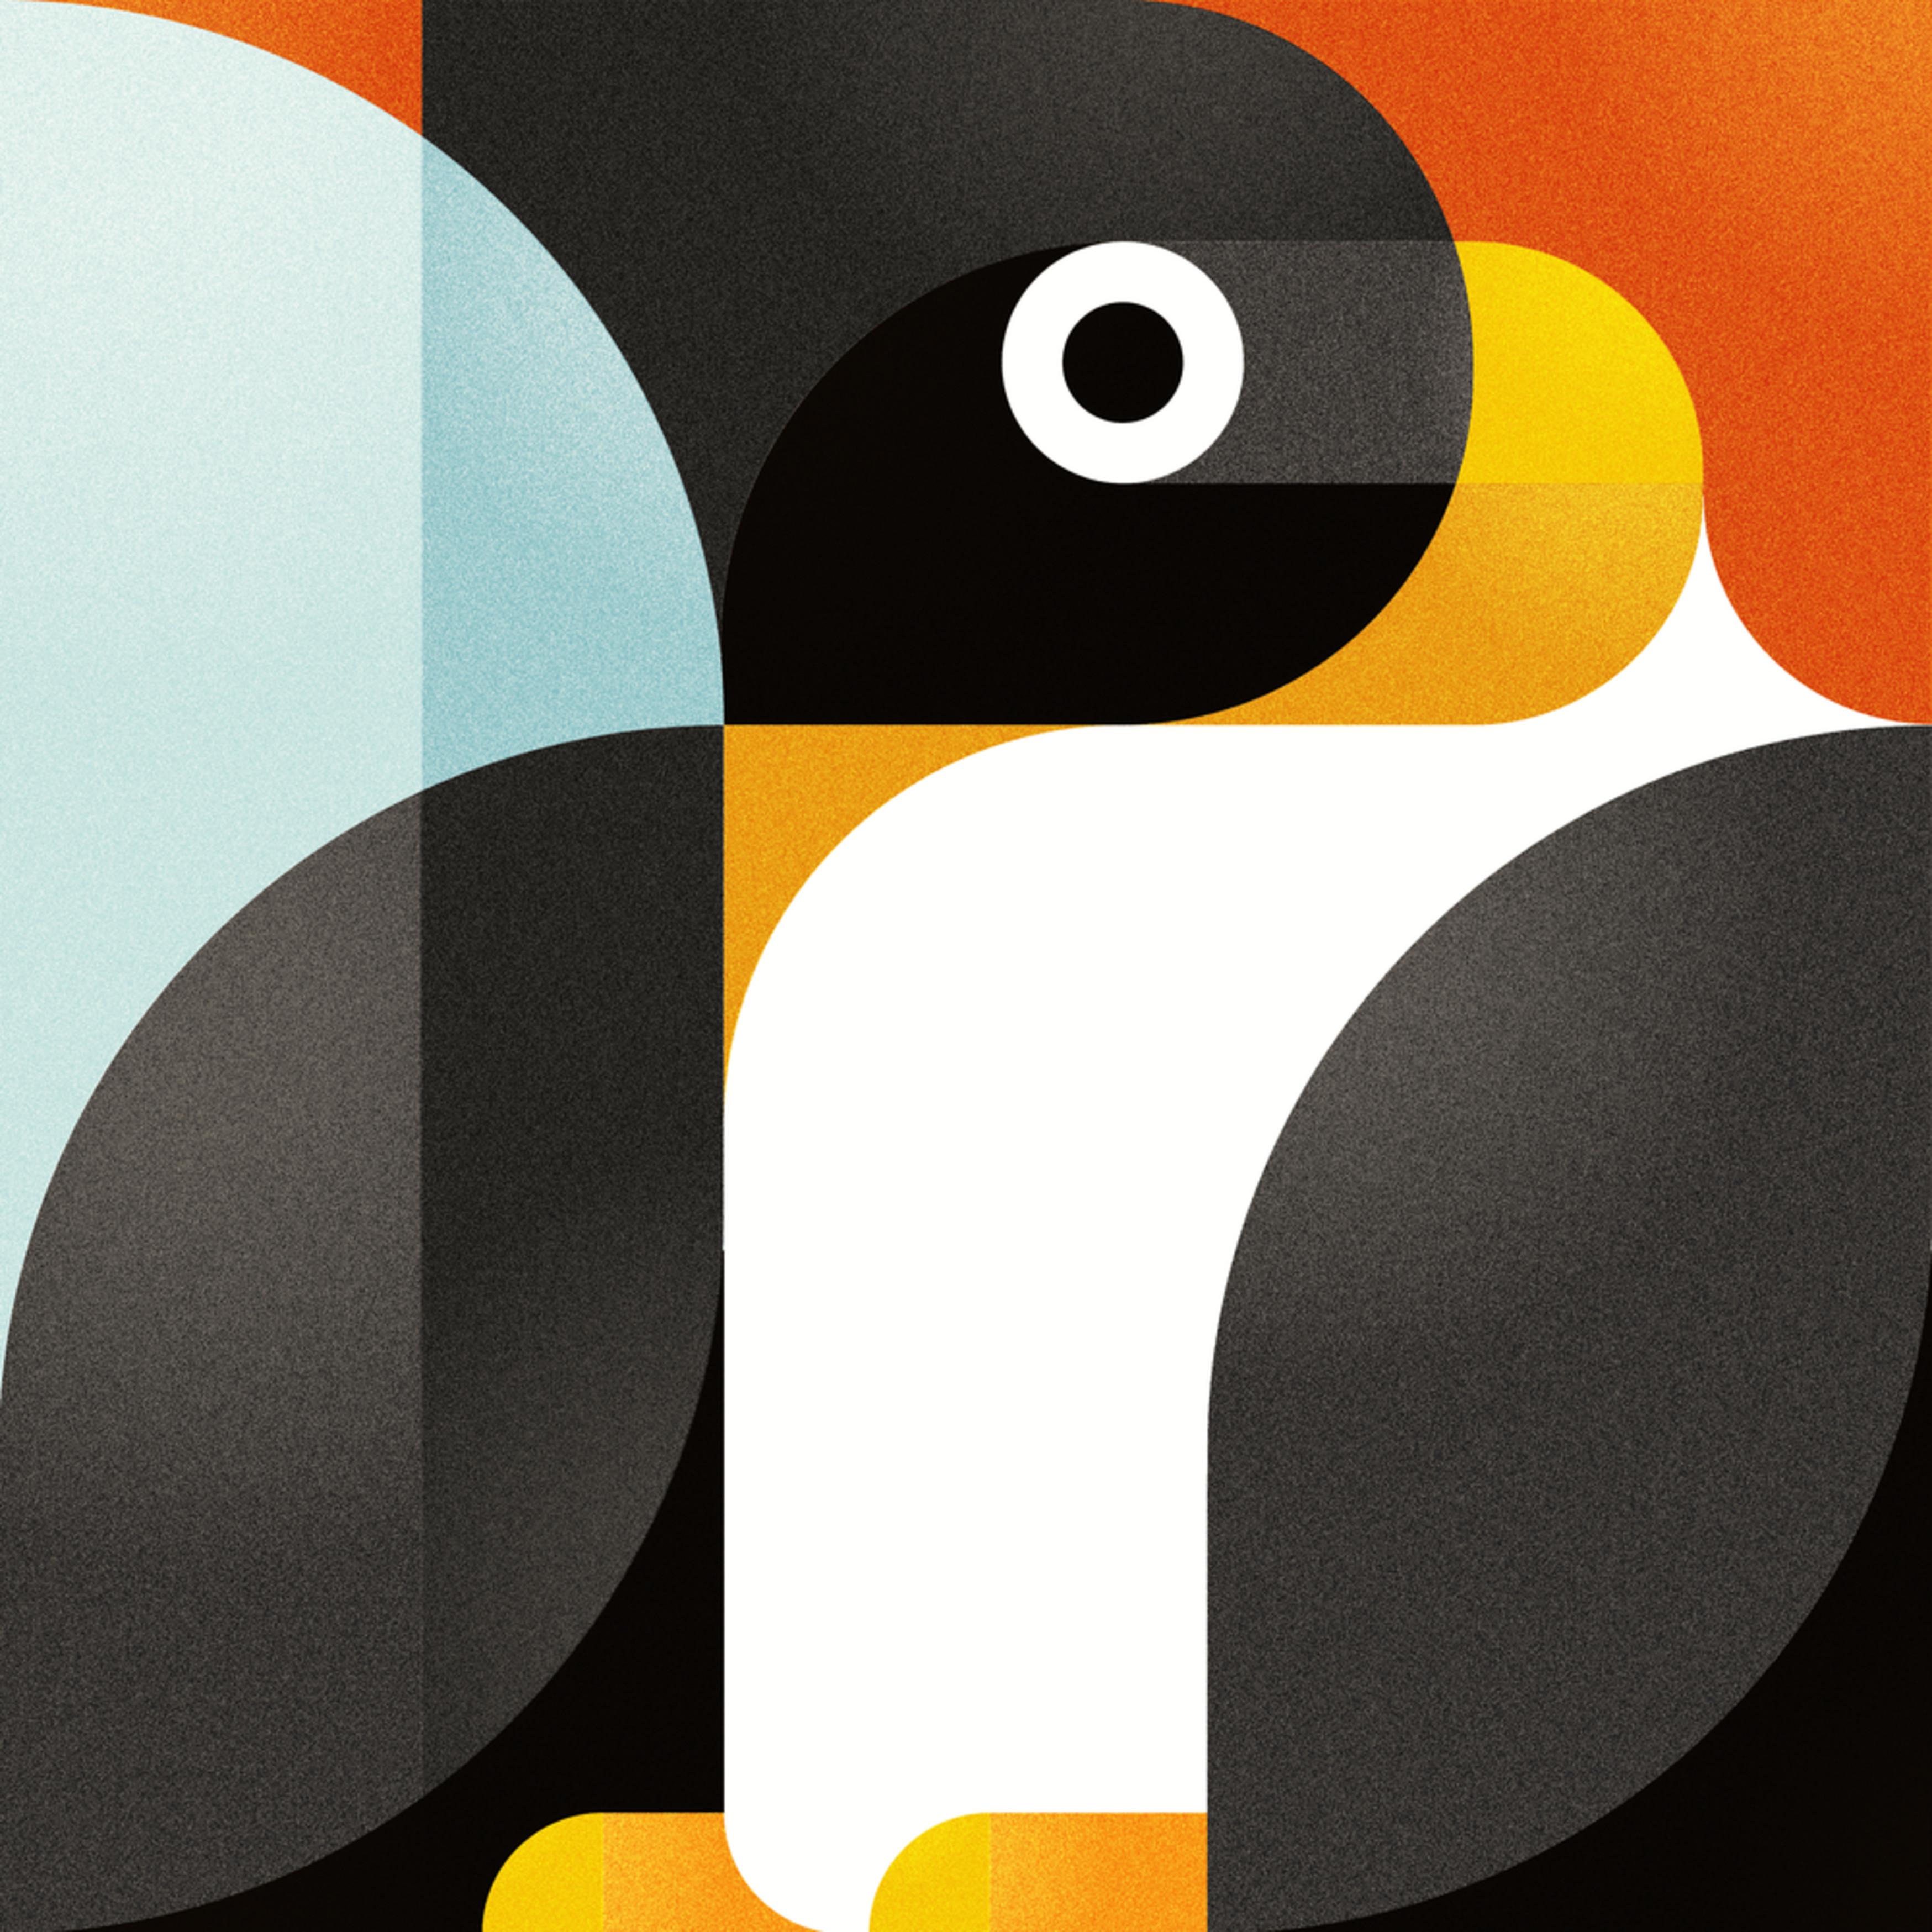 Pingouin squaredhd bkokgy